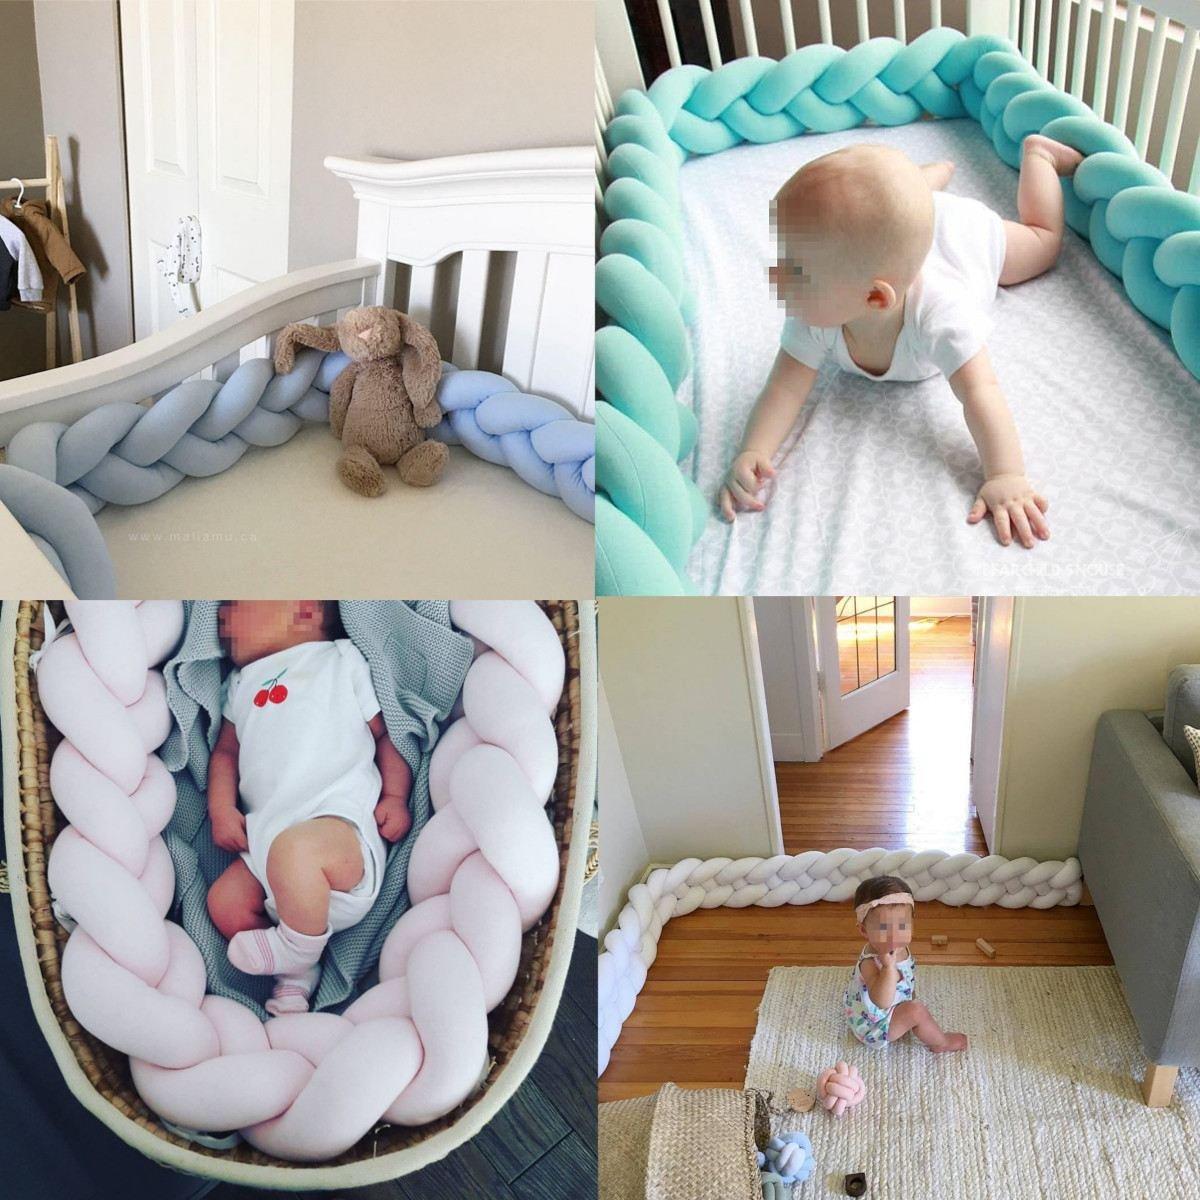 Amazon.com: Anudada trenza almohada ins estilo nórdico ...